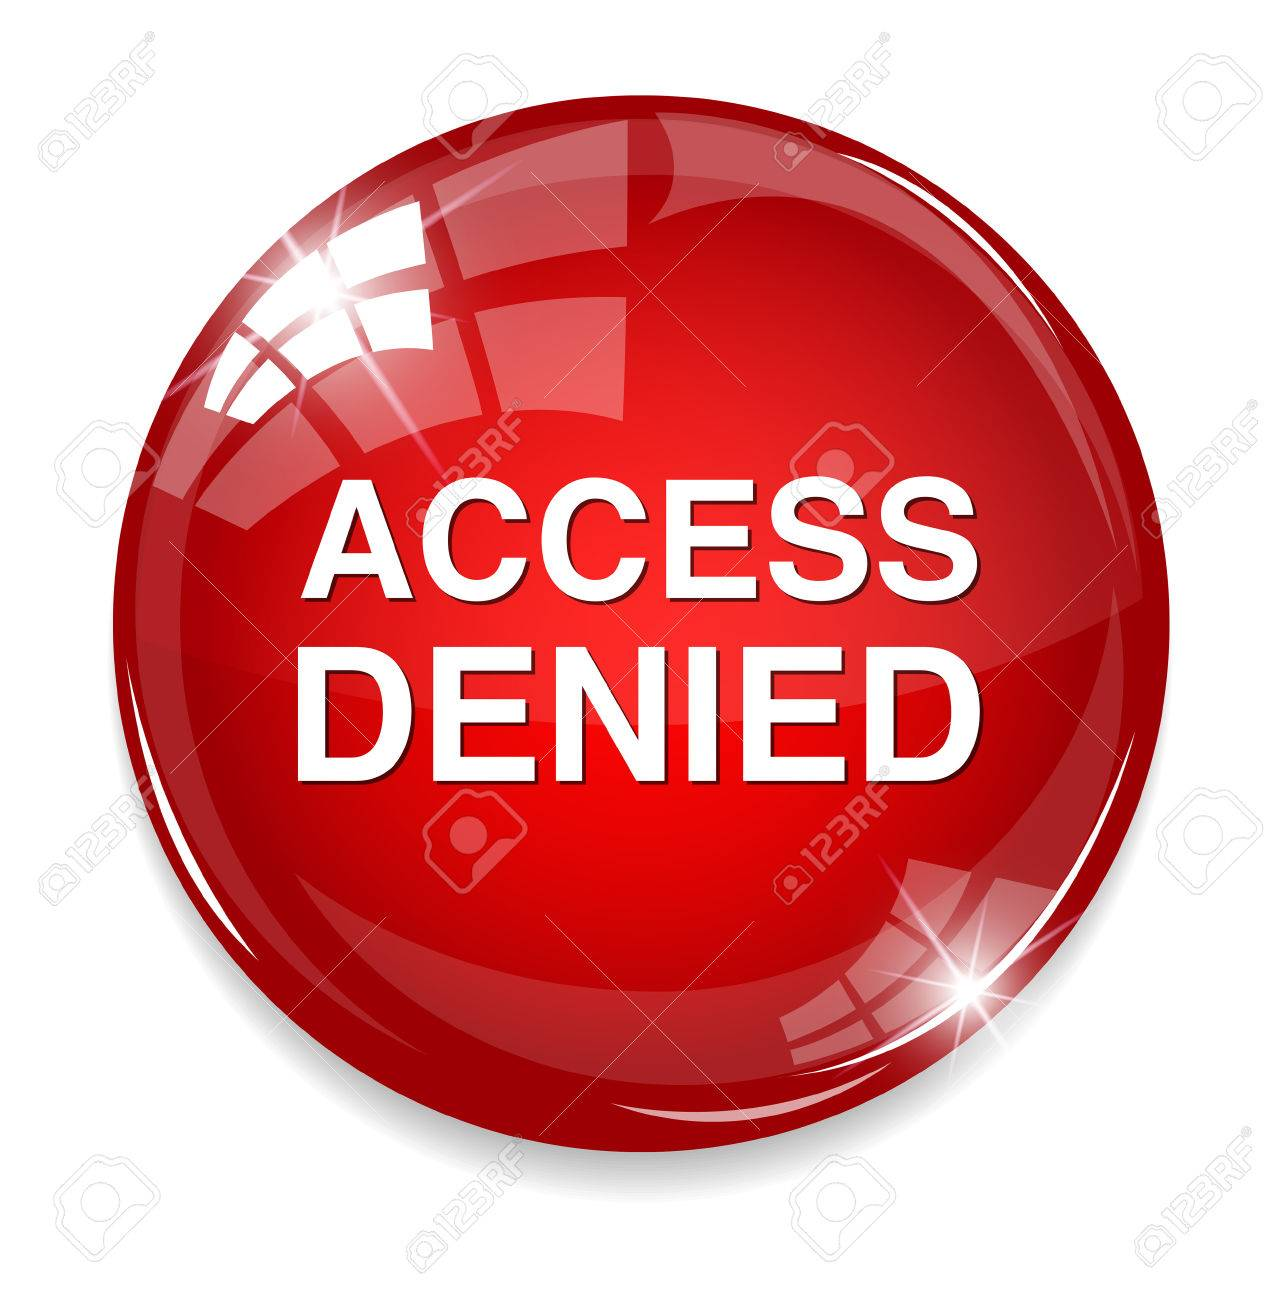 Security Concept Access Denied Button St-Security concept Access Denied button Stock Vector - 32210541-12